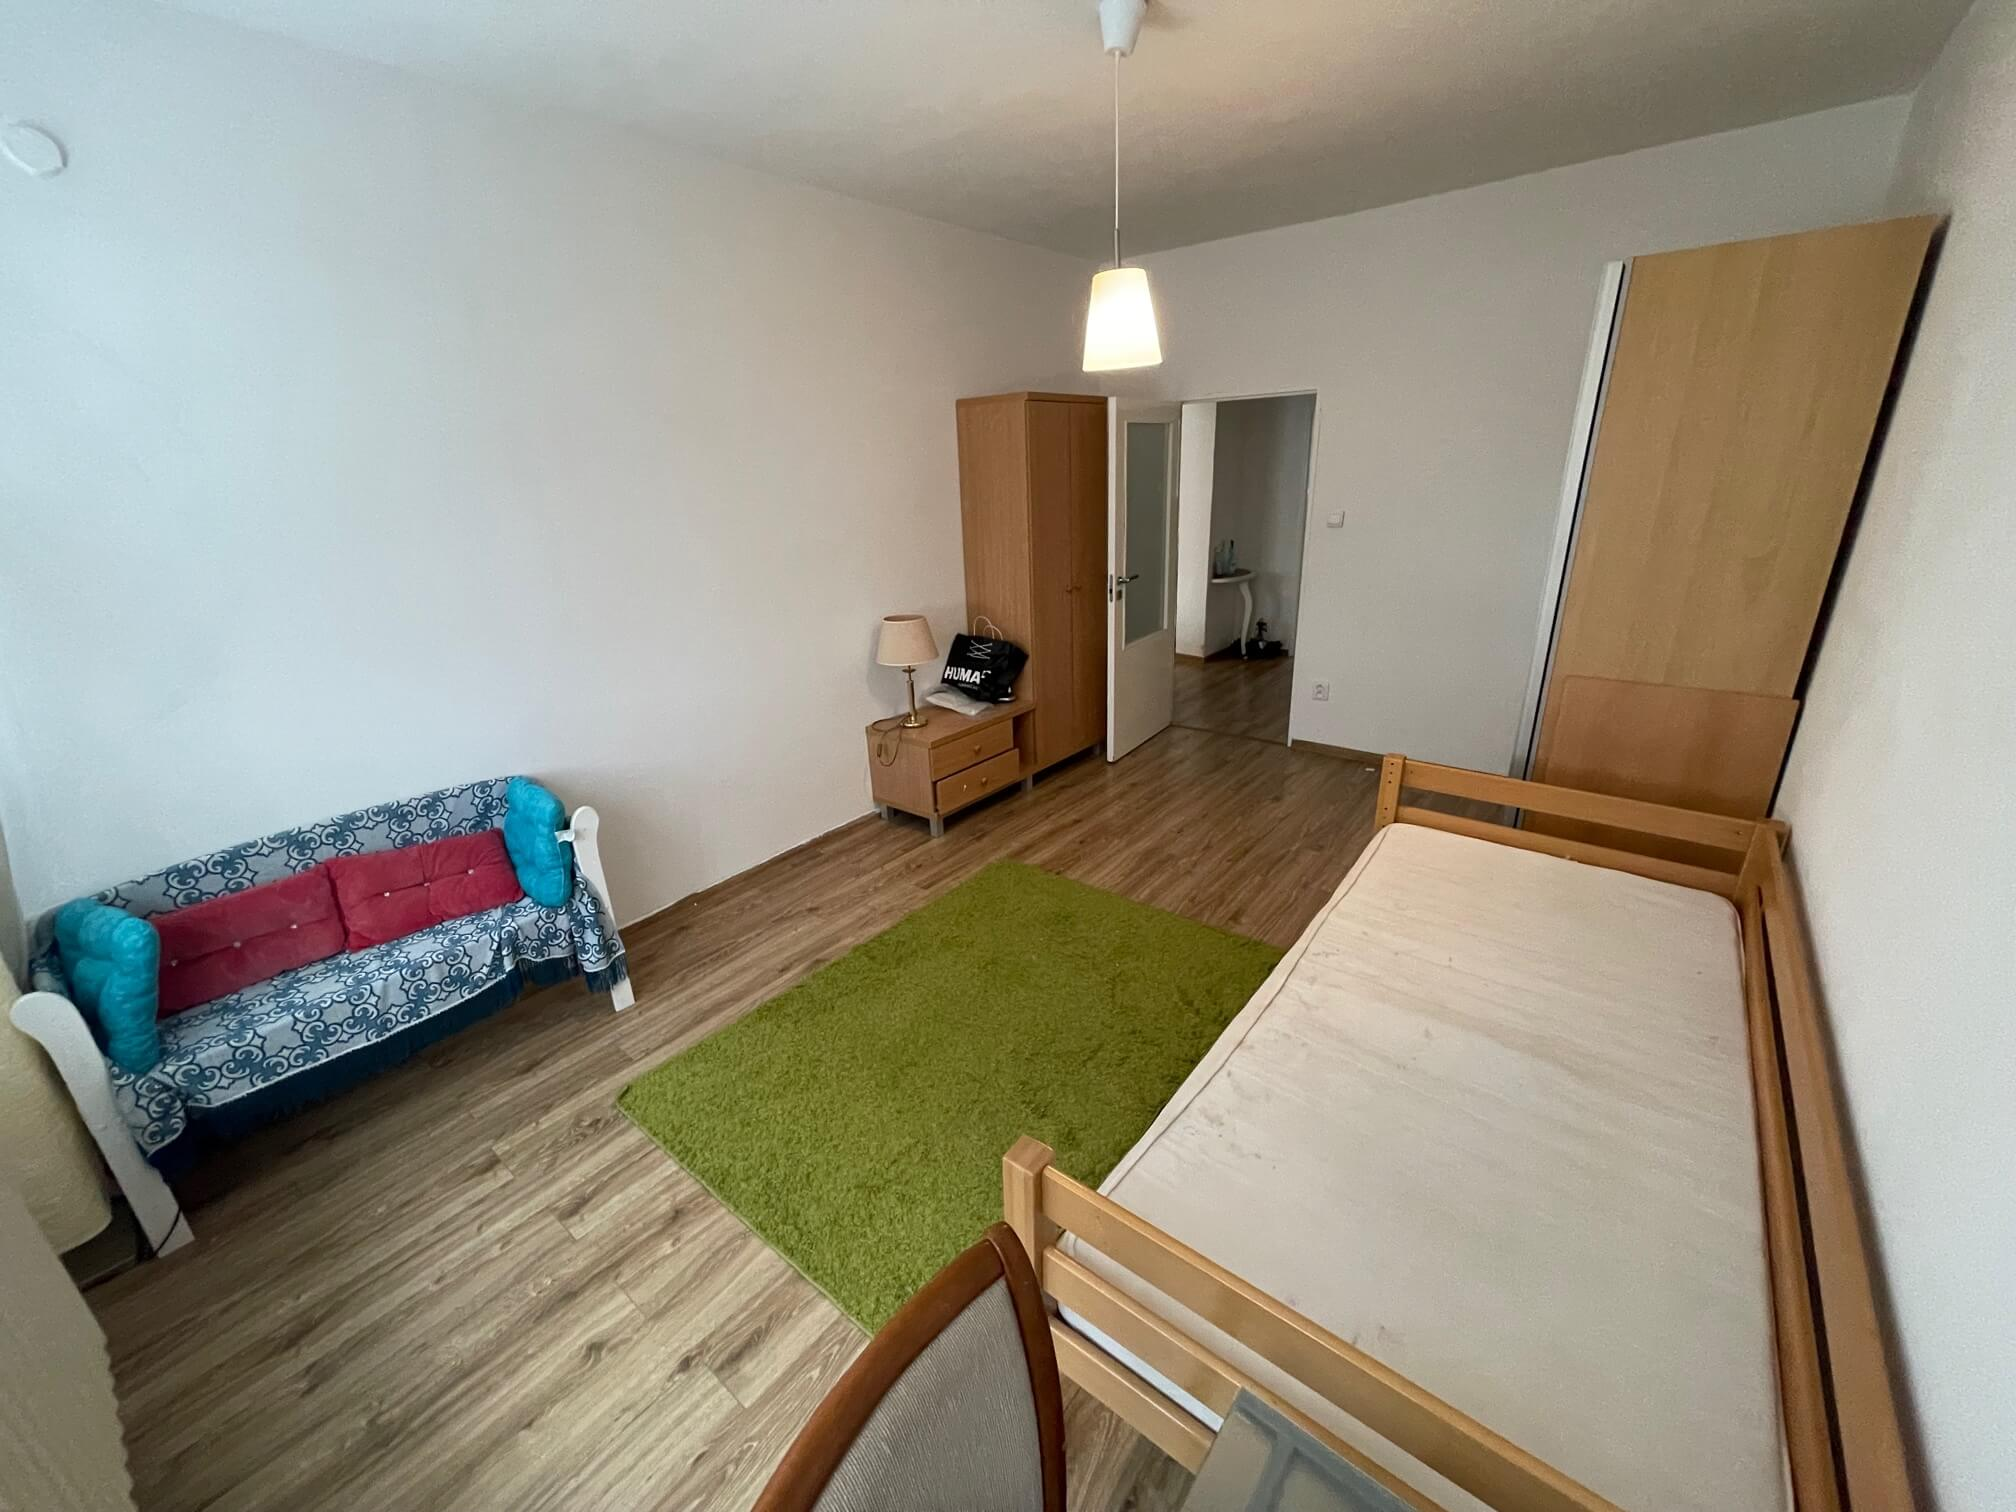 Exkluzívne na prenájom 3 izbový byt, 83m2, 2x loggia 4,5m2, Karolovka, Janotová 8-9